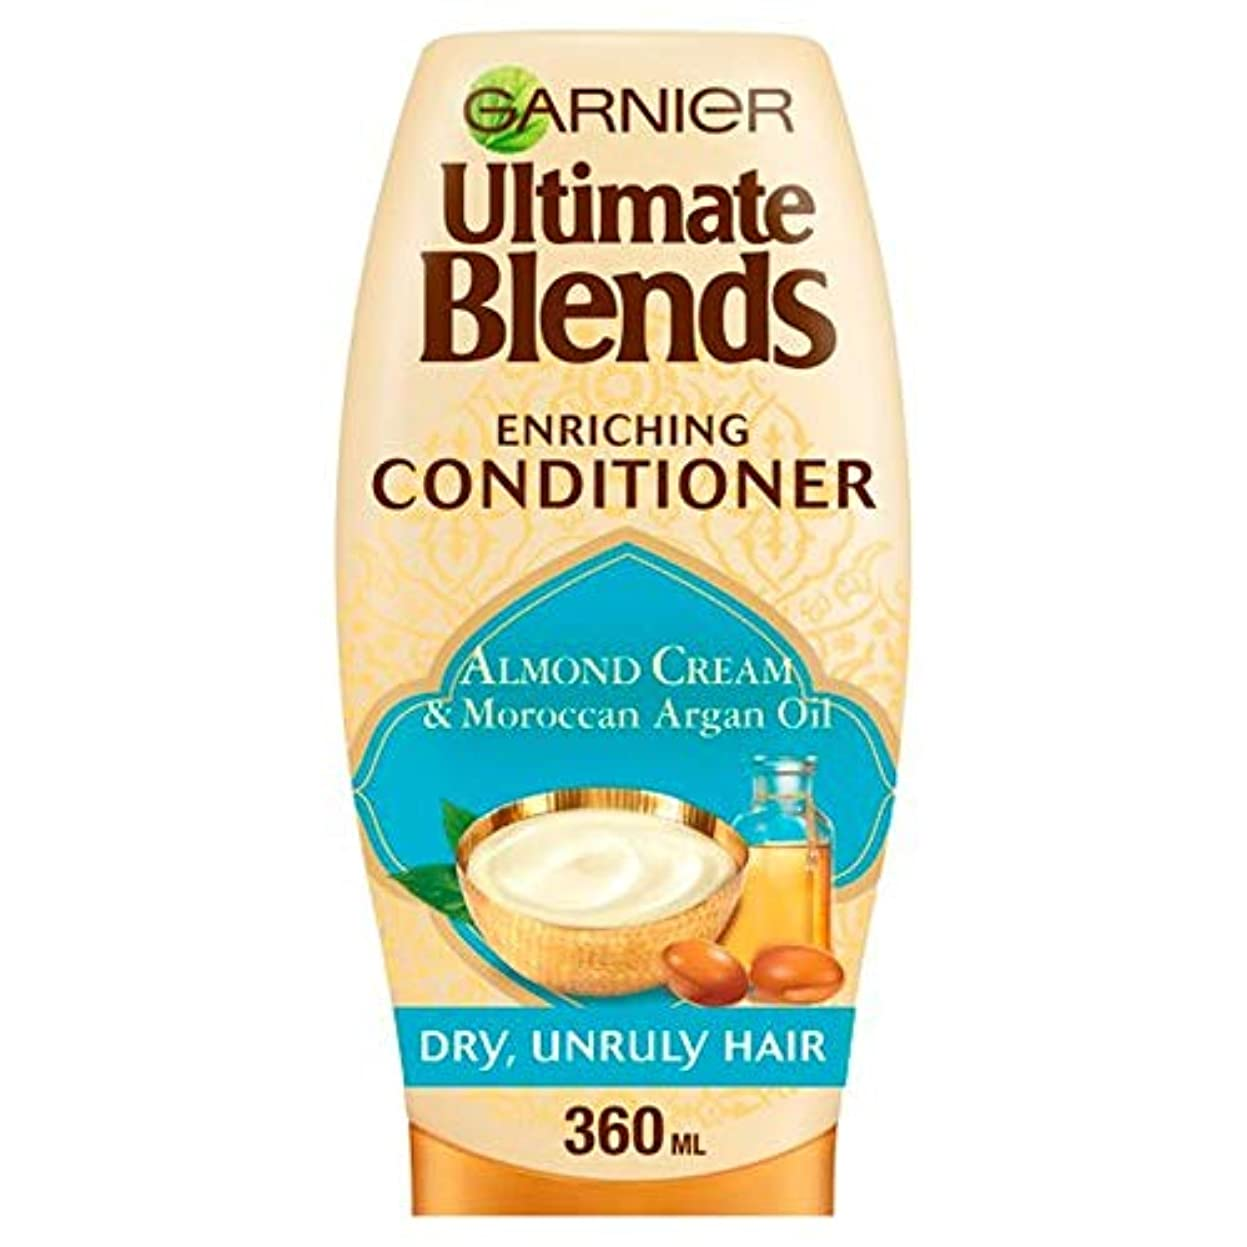 [Garnier ] Ga/究極ブレンドのArg/油及びアーモンドDr / Hrでコンディショナー360ミリリットルRを - Ga/R Ultimate Blends Arg/Oil And Almond Dr/Hr Conditioner...